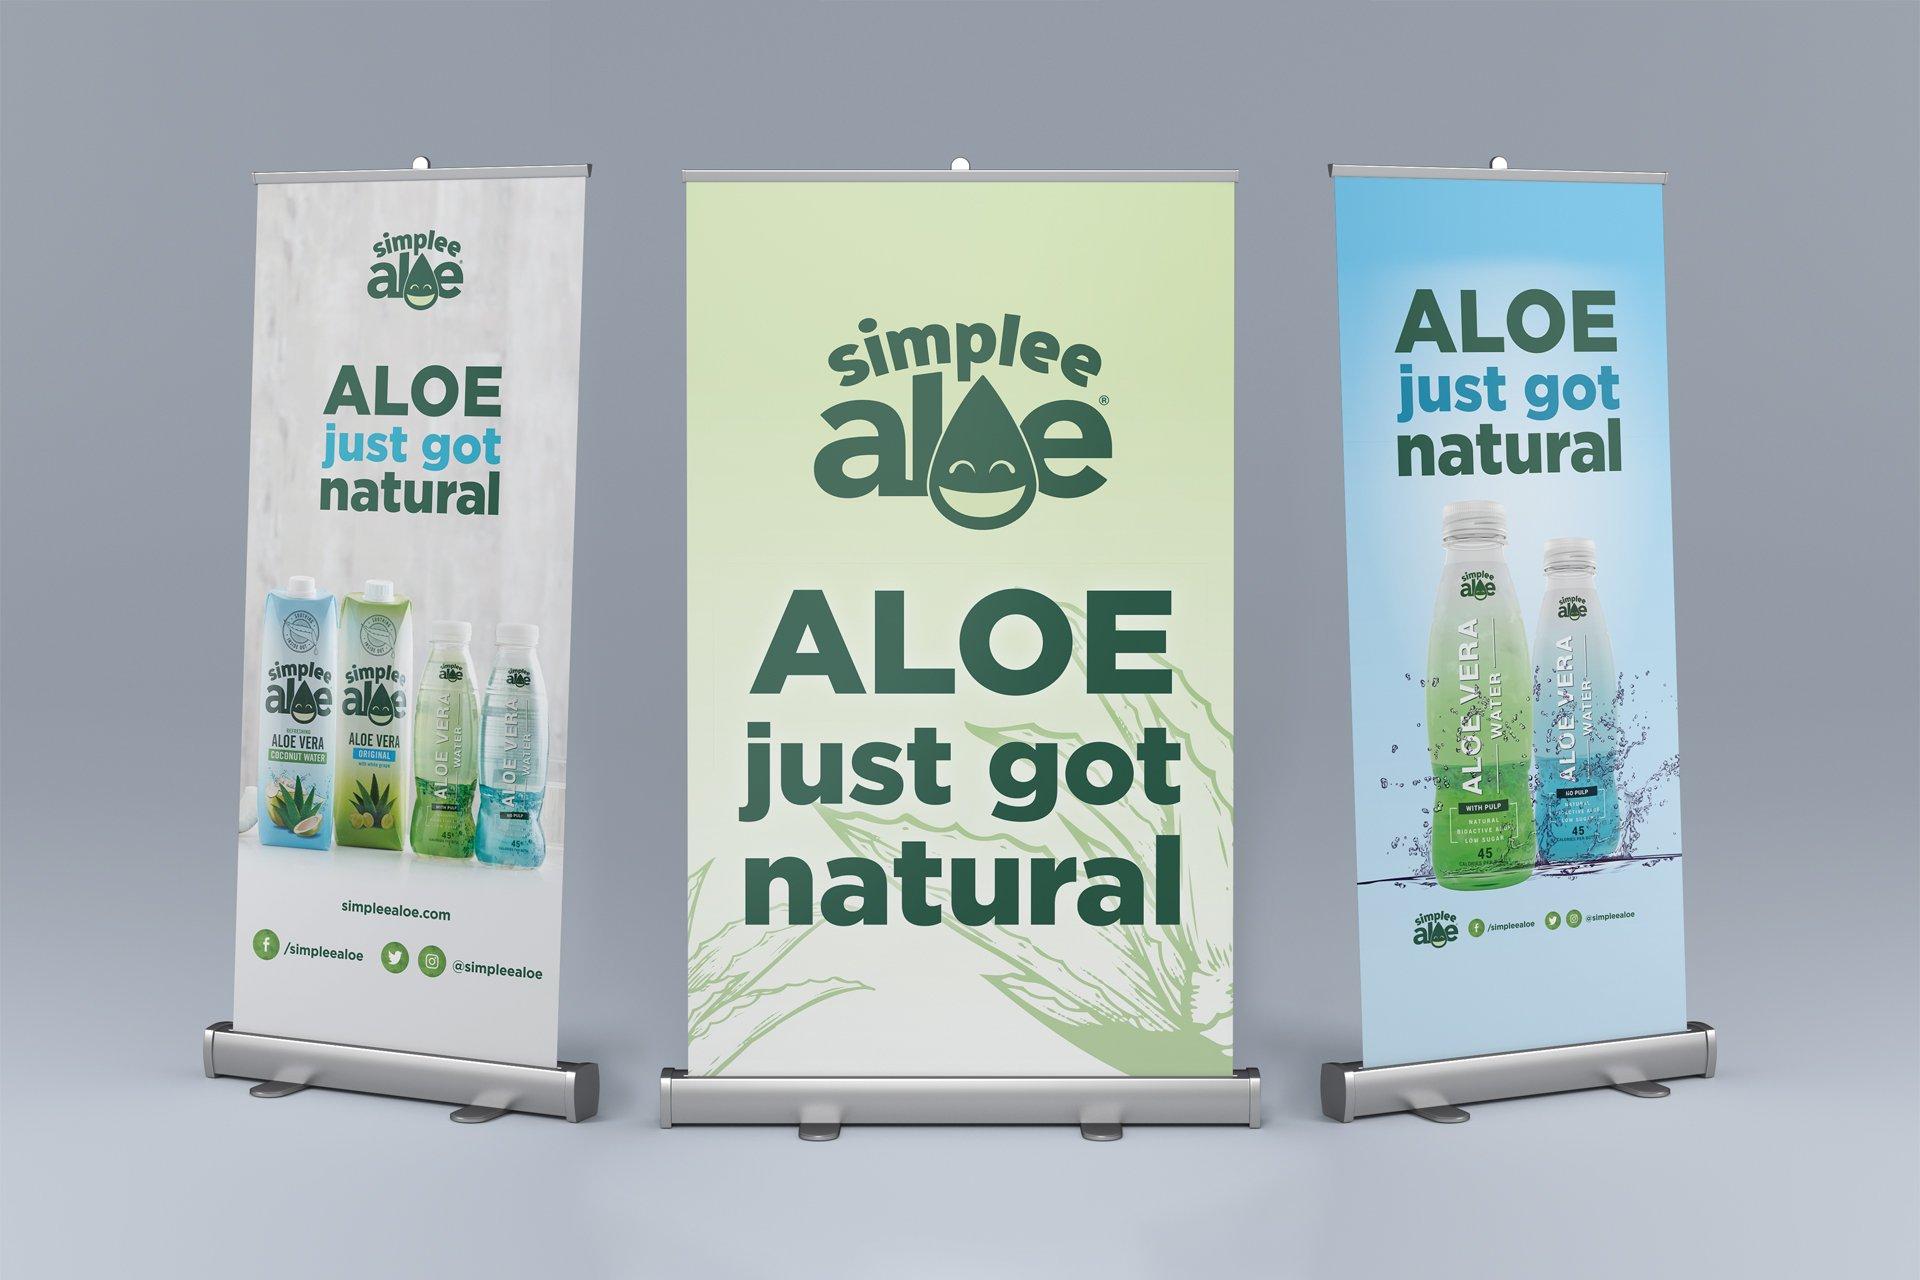 simplee aloe event signage